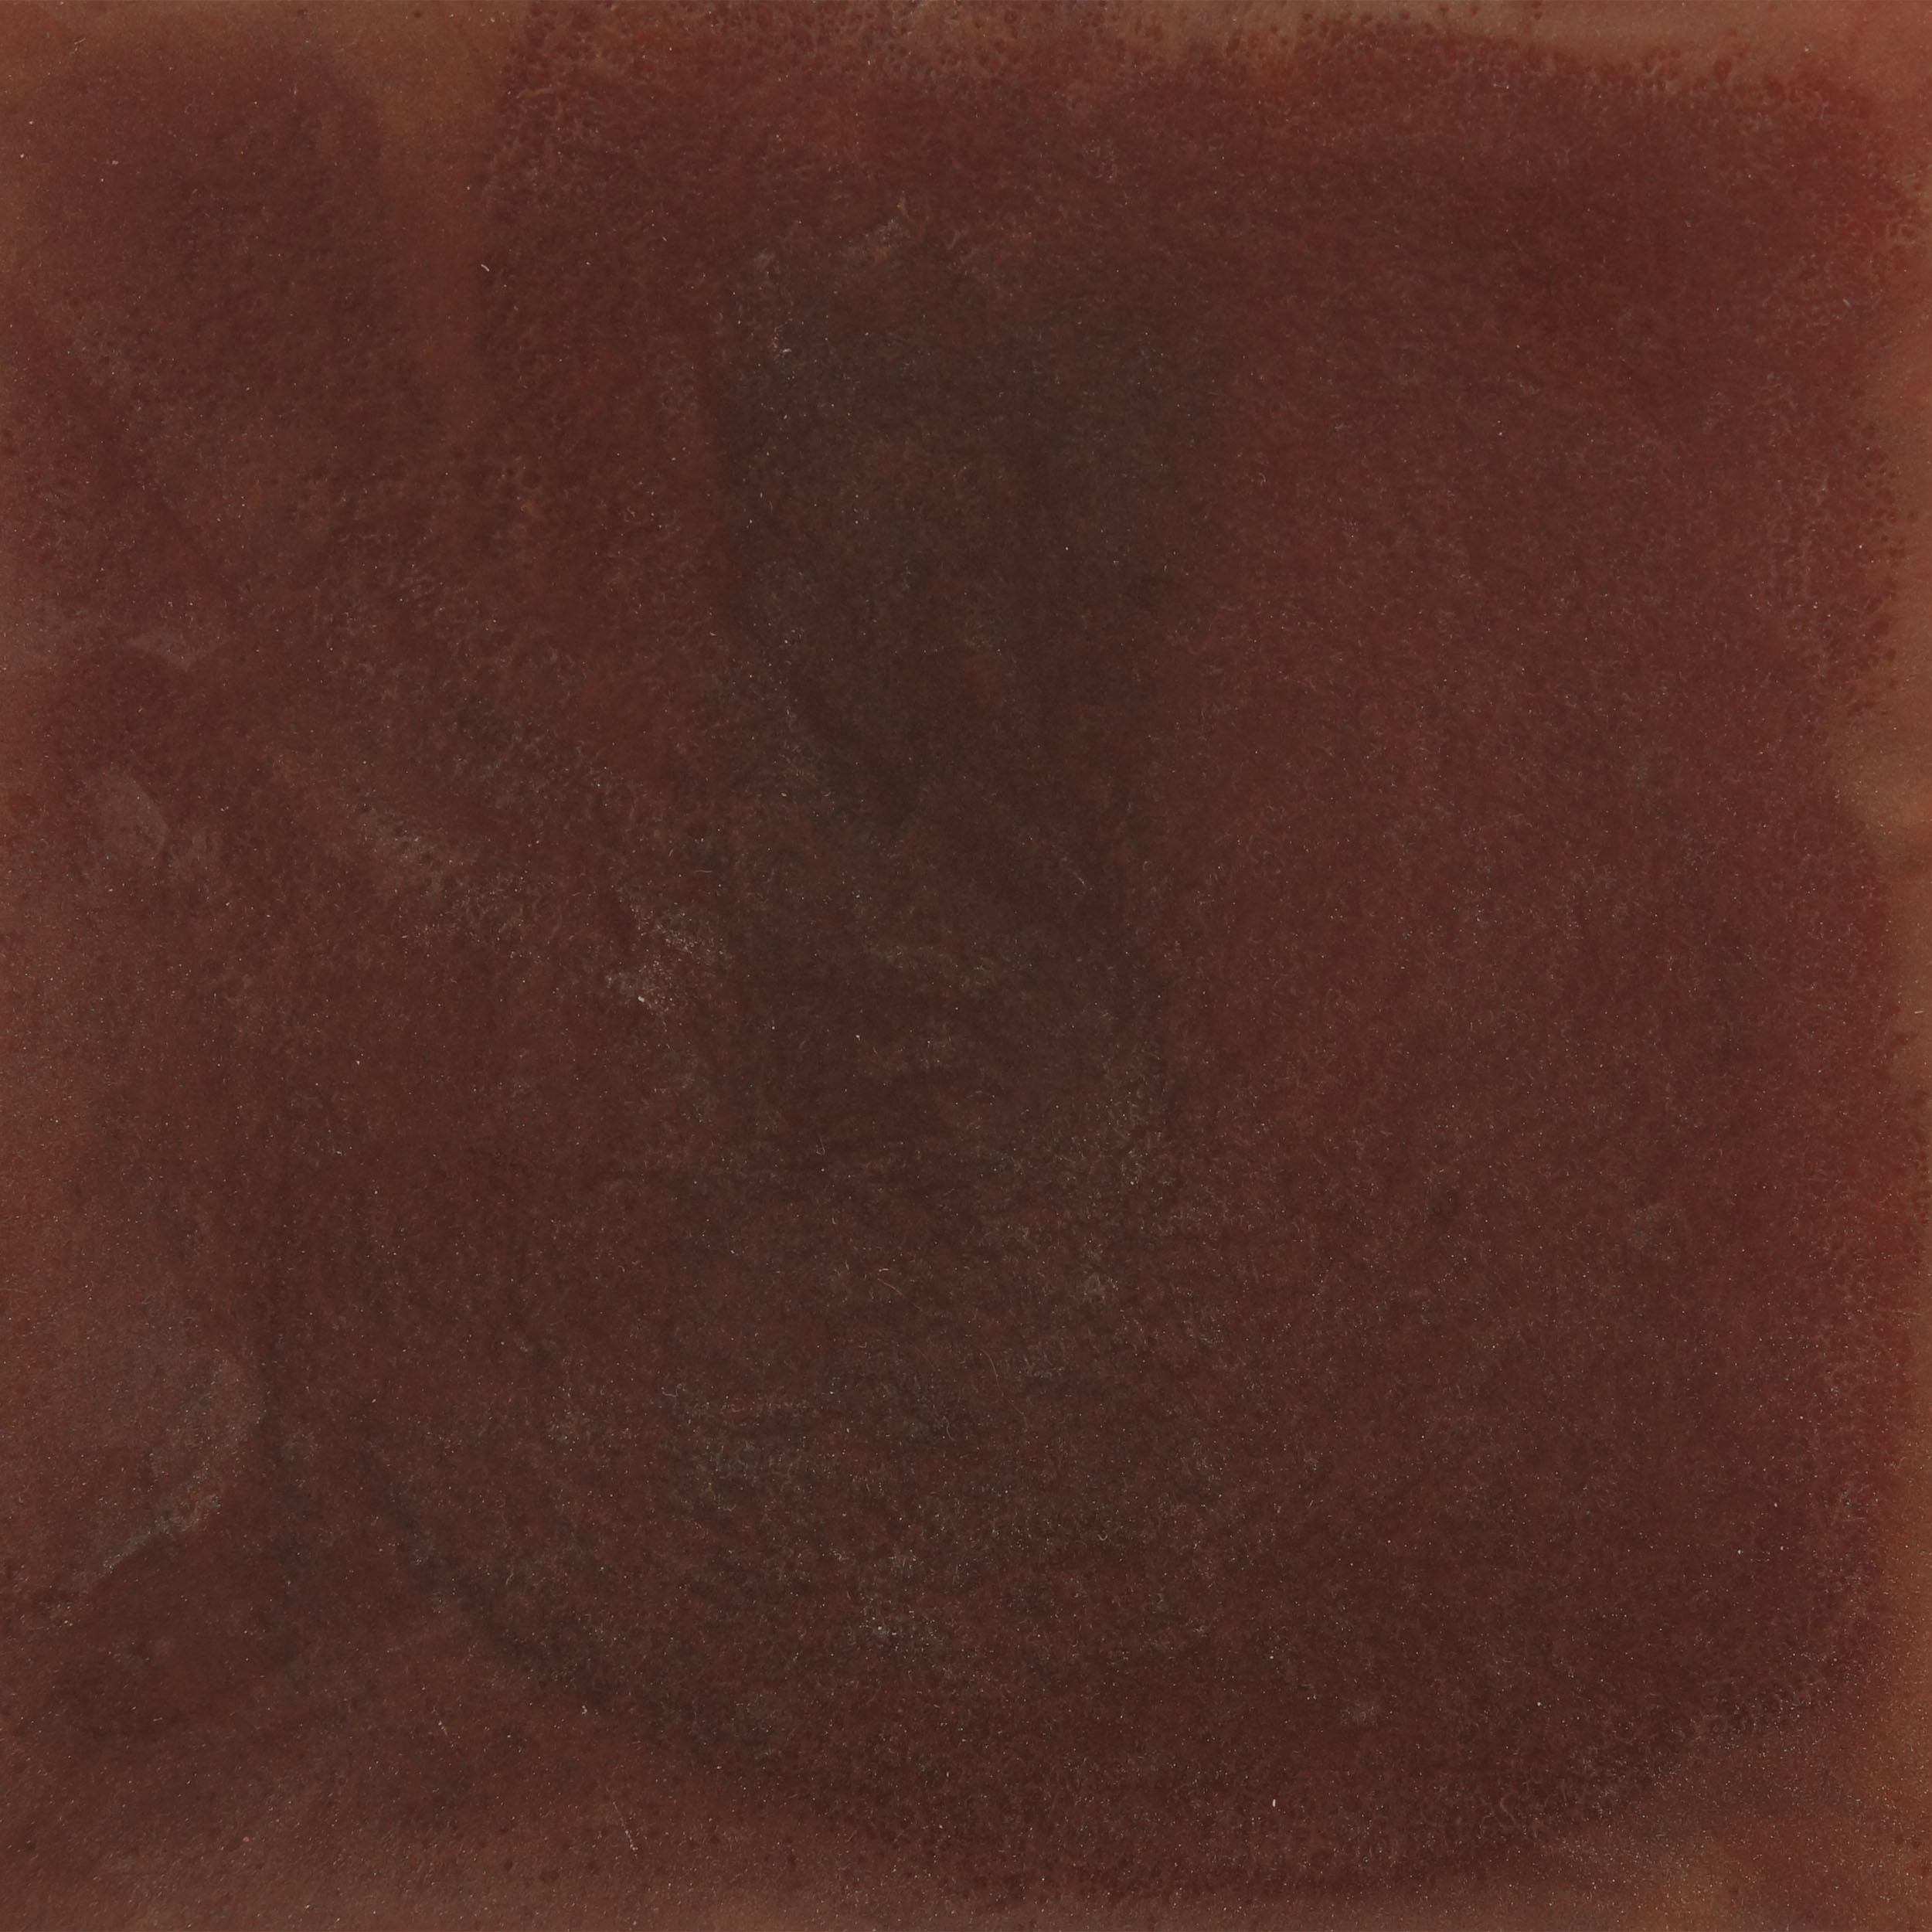 Kiwi Epoxy Resin Color Sample